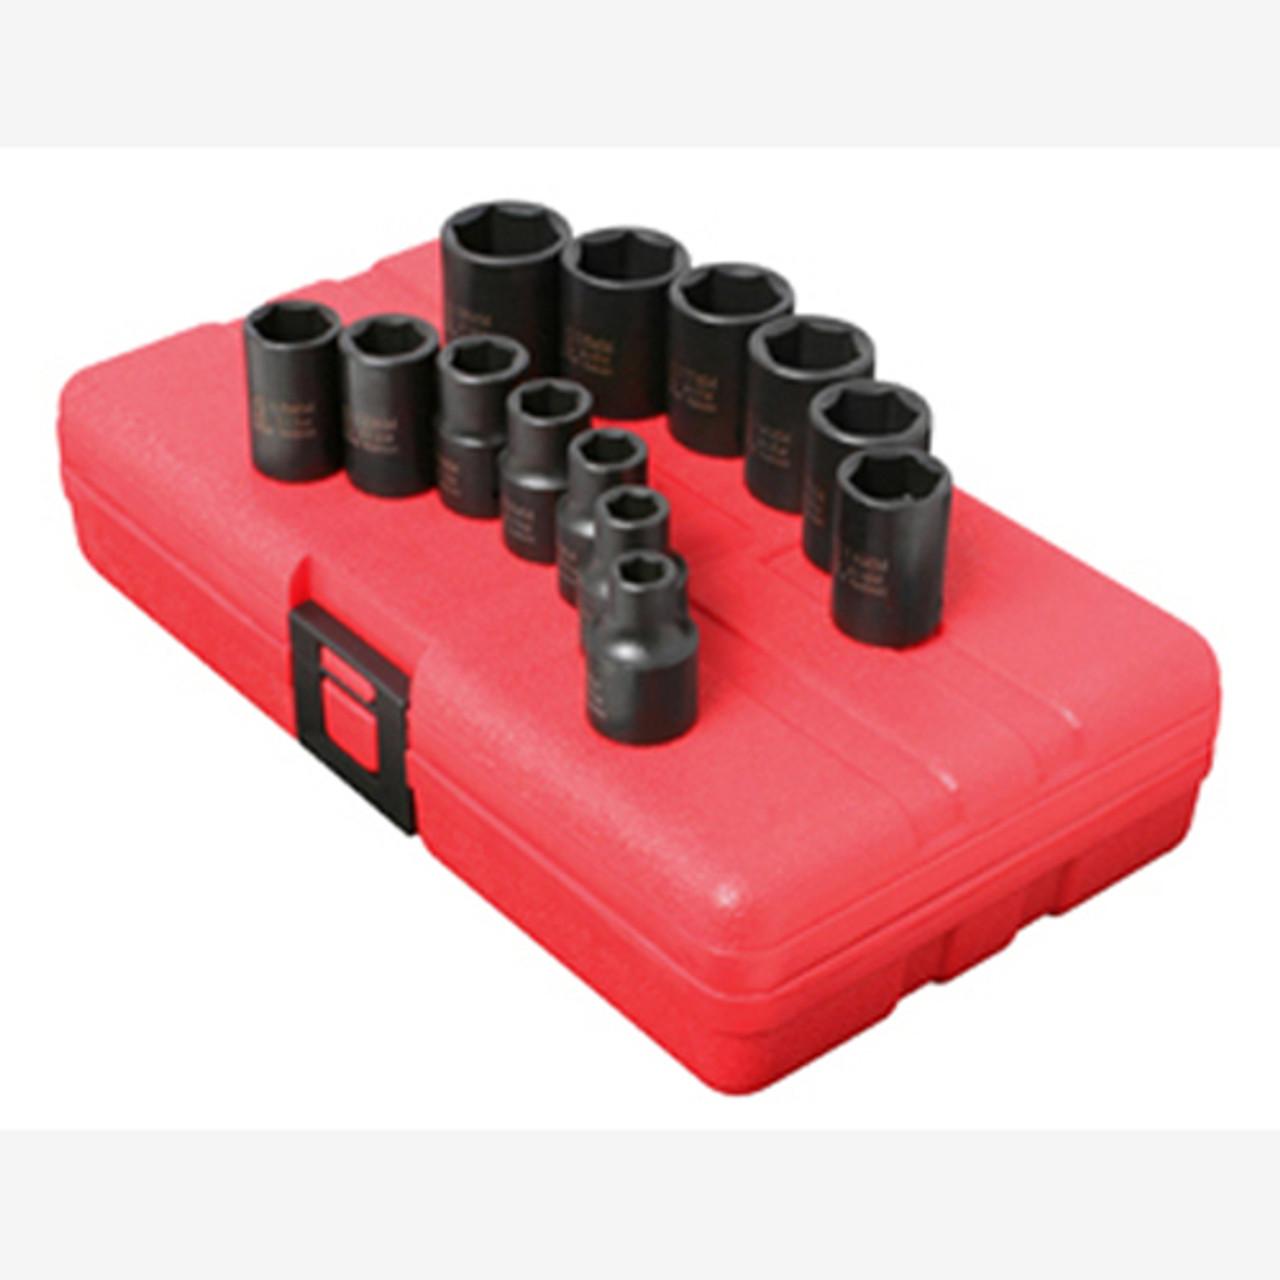 Sunex 315m 3//8-Inch Drive 15-Mm Impact Socket